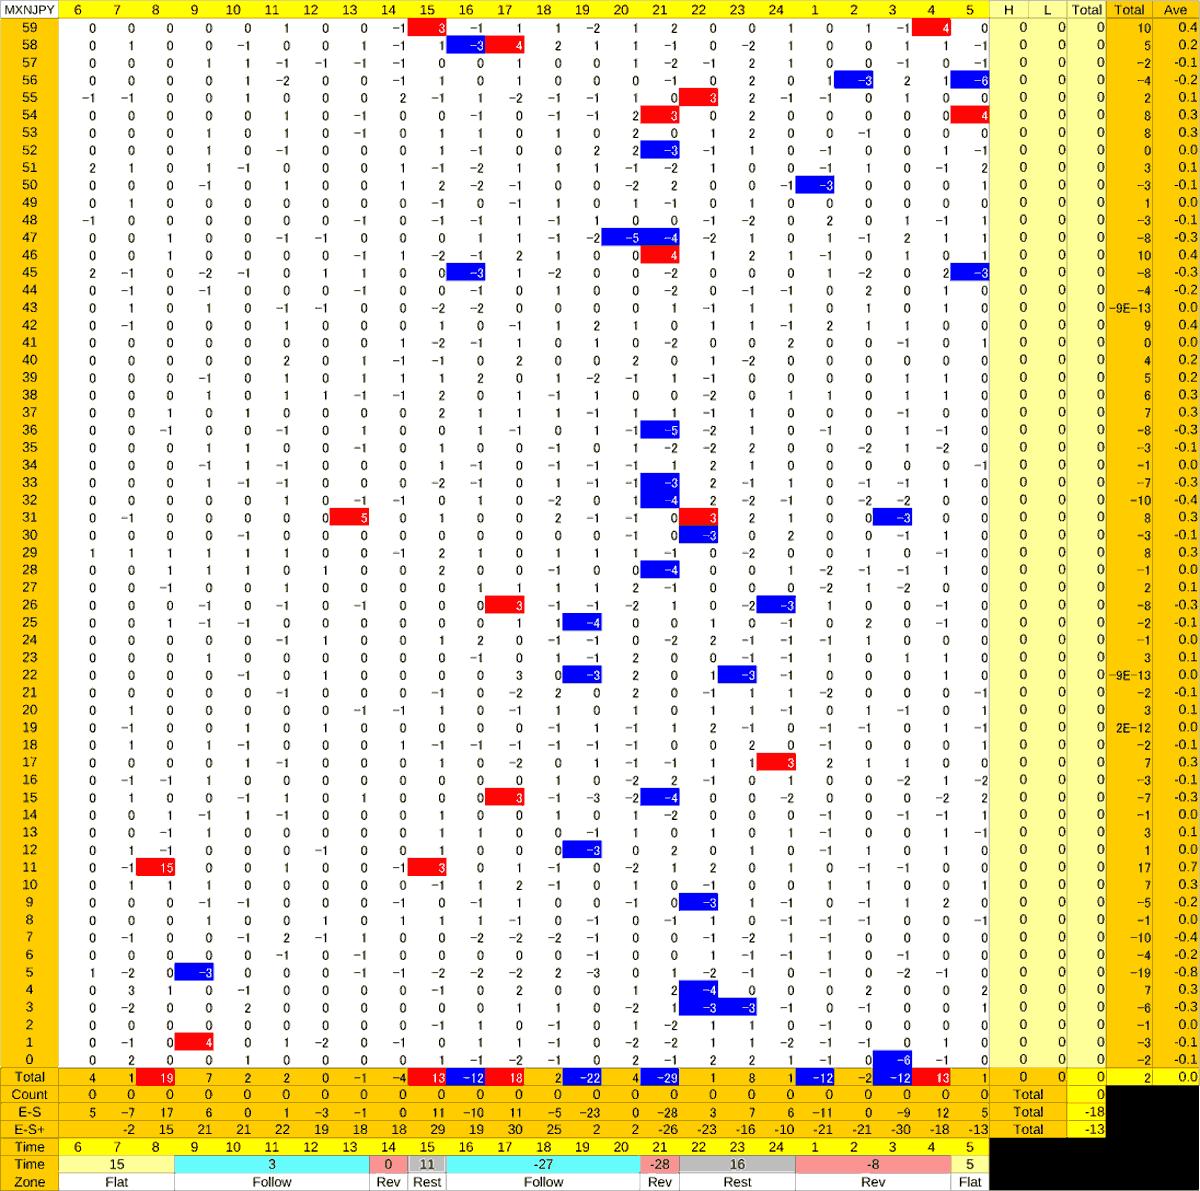 20200804_HS(3)MXNJPY